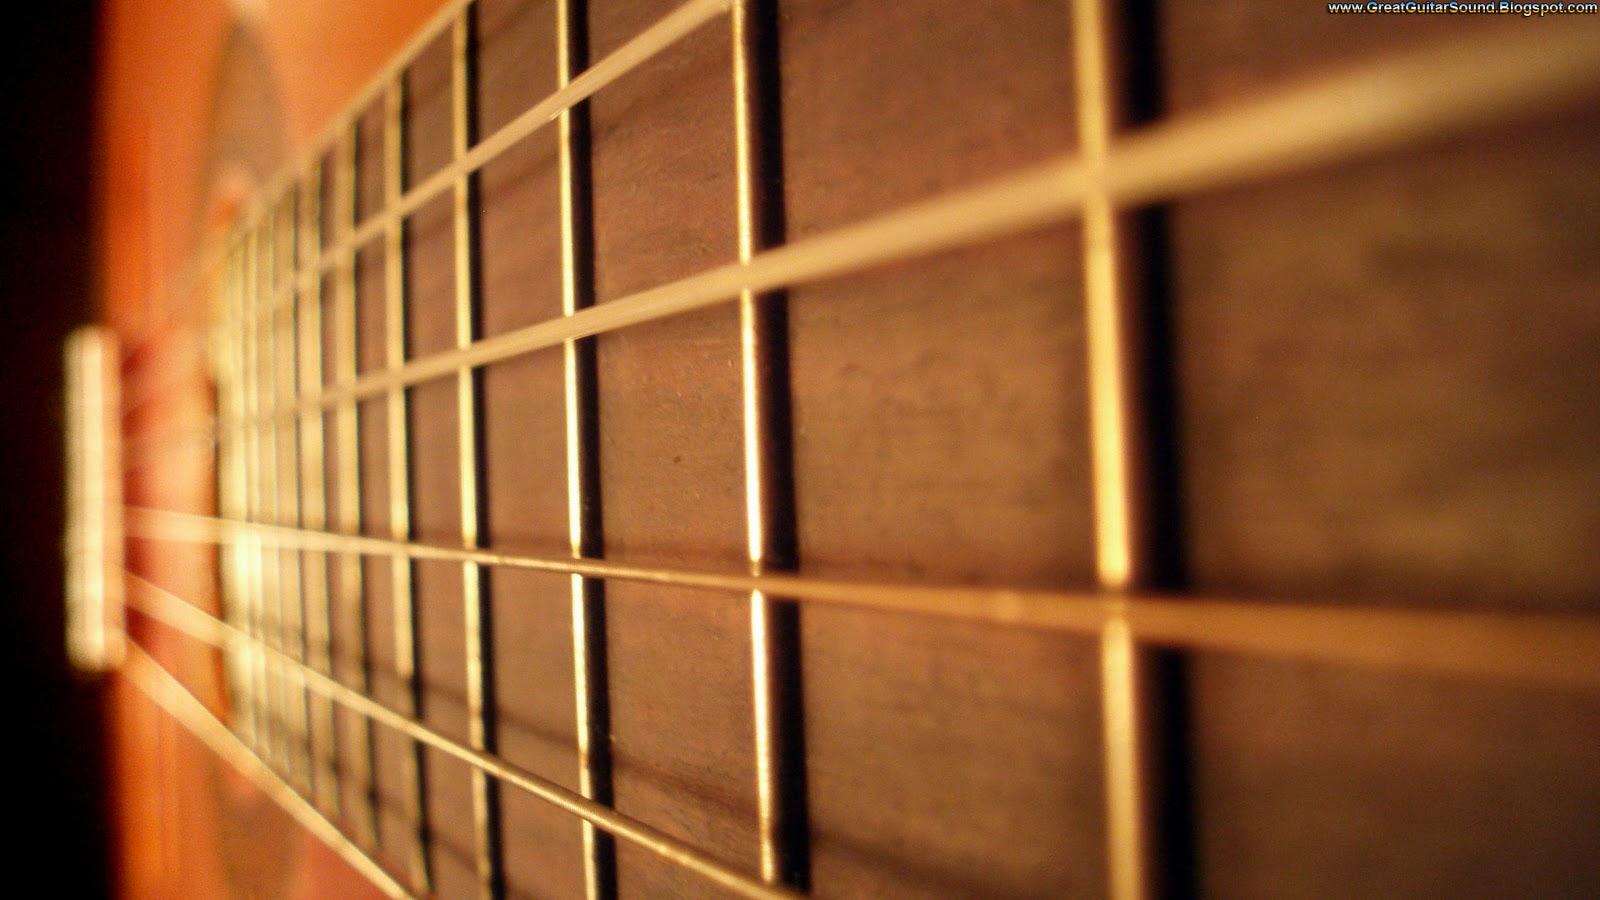 great guitar sound guitar wallpaper landola c 55 classical guitar fretboard 1920x1080. Black Bedroom Furniture Sets. Home Design Ideas